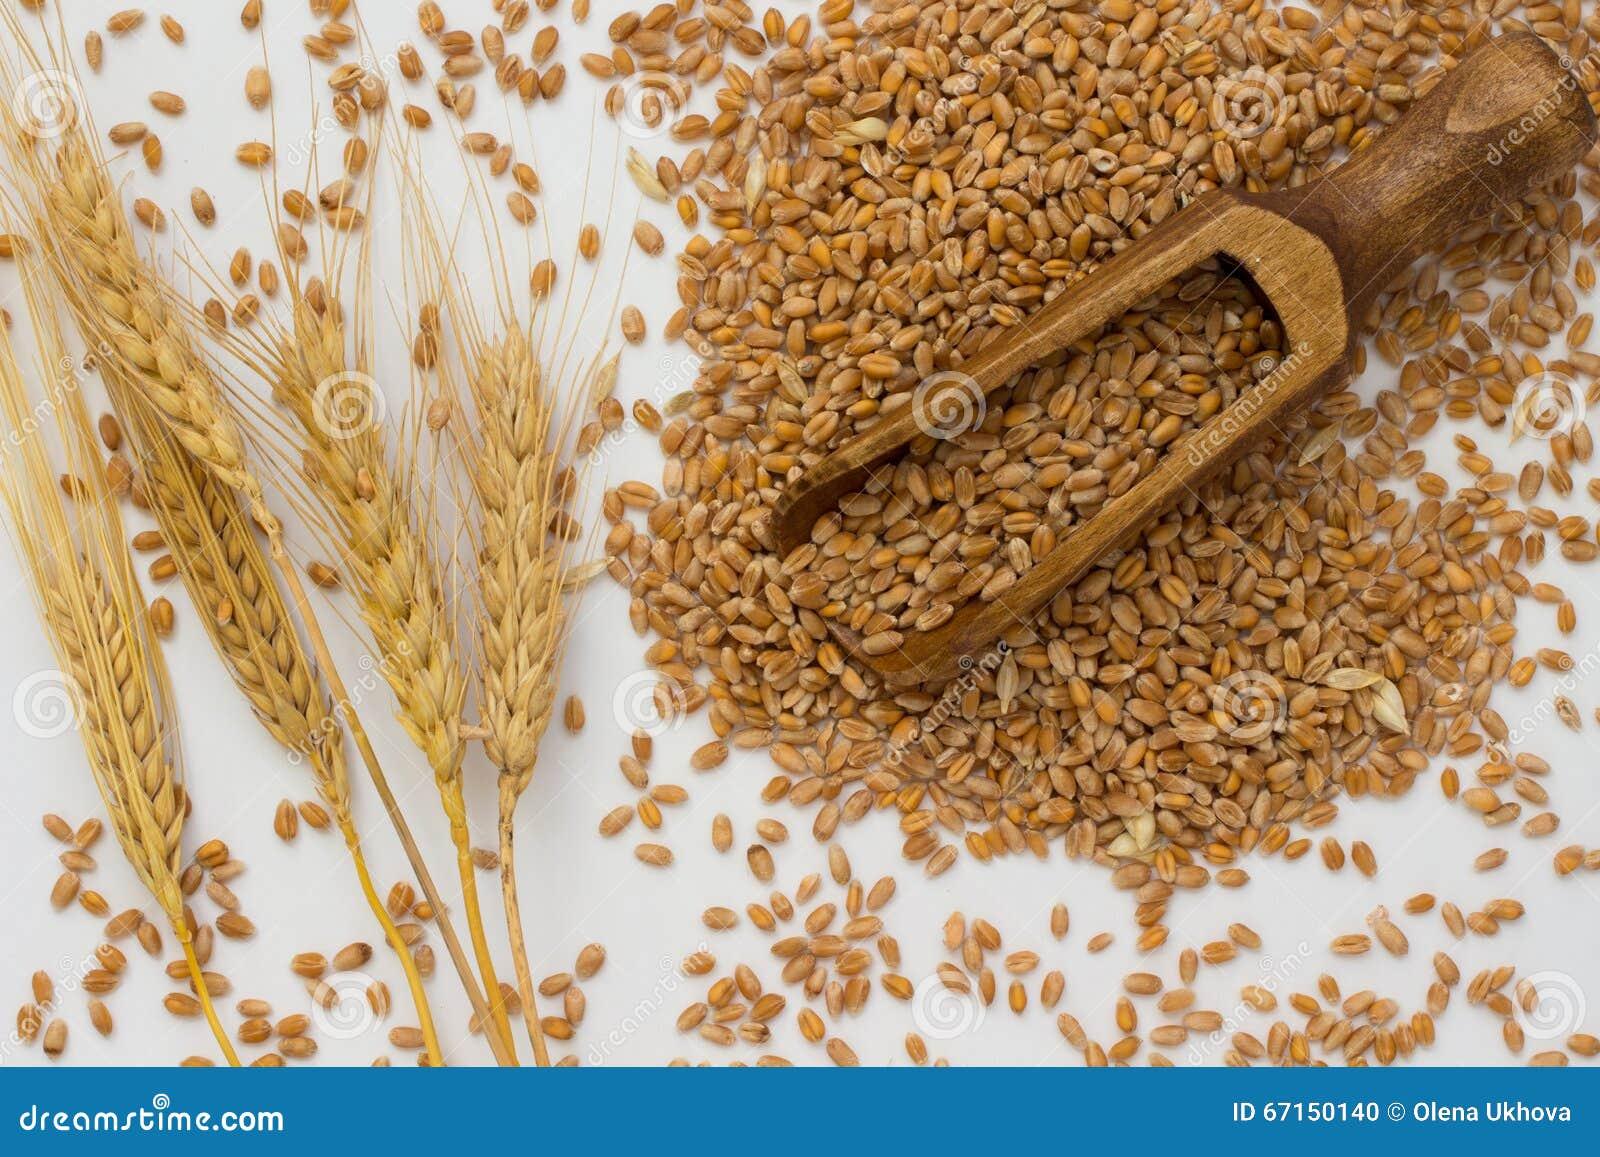 Grains of wheat, wooden spoon, barley